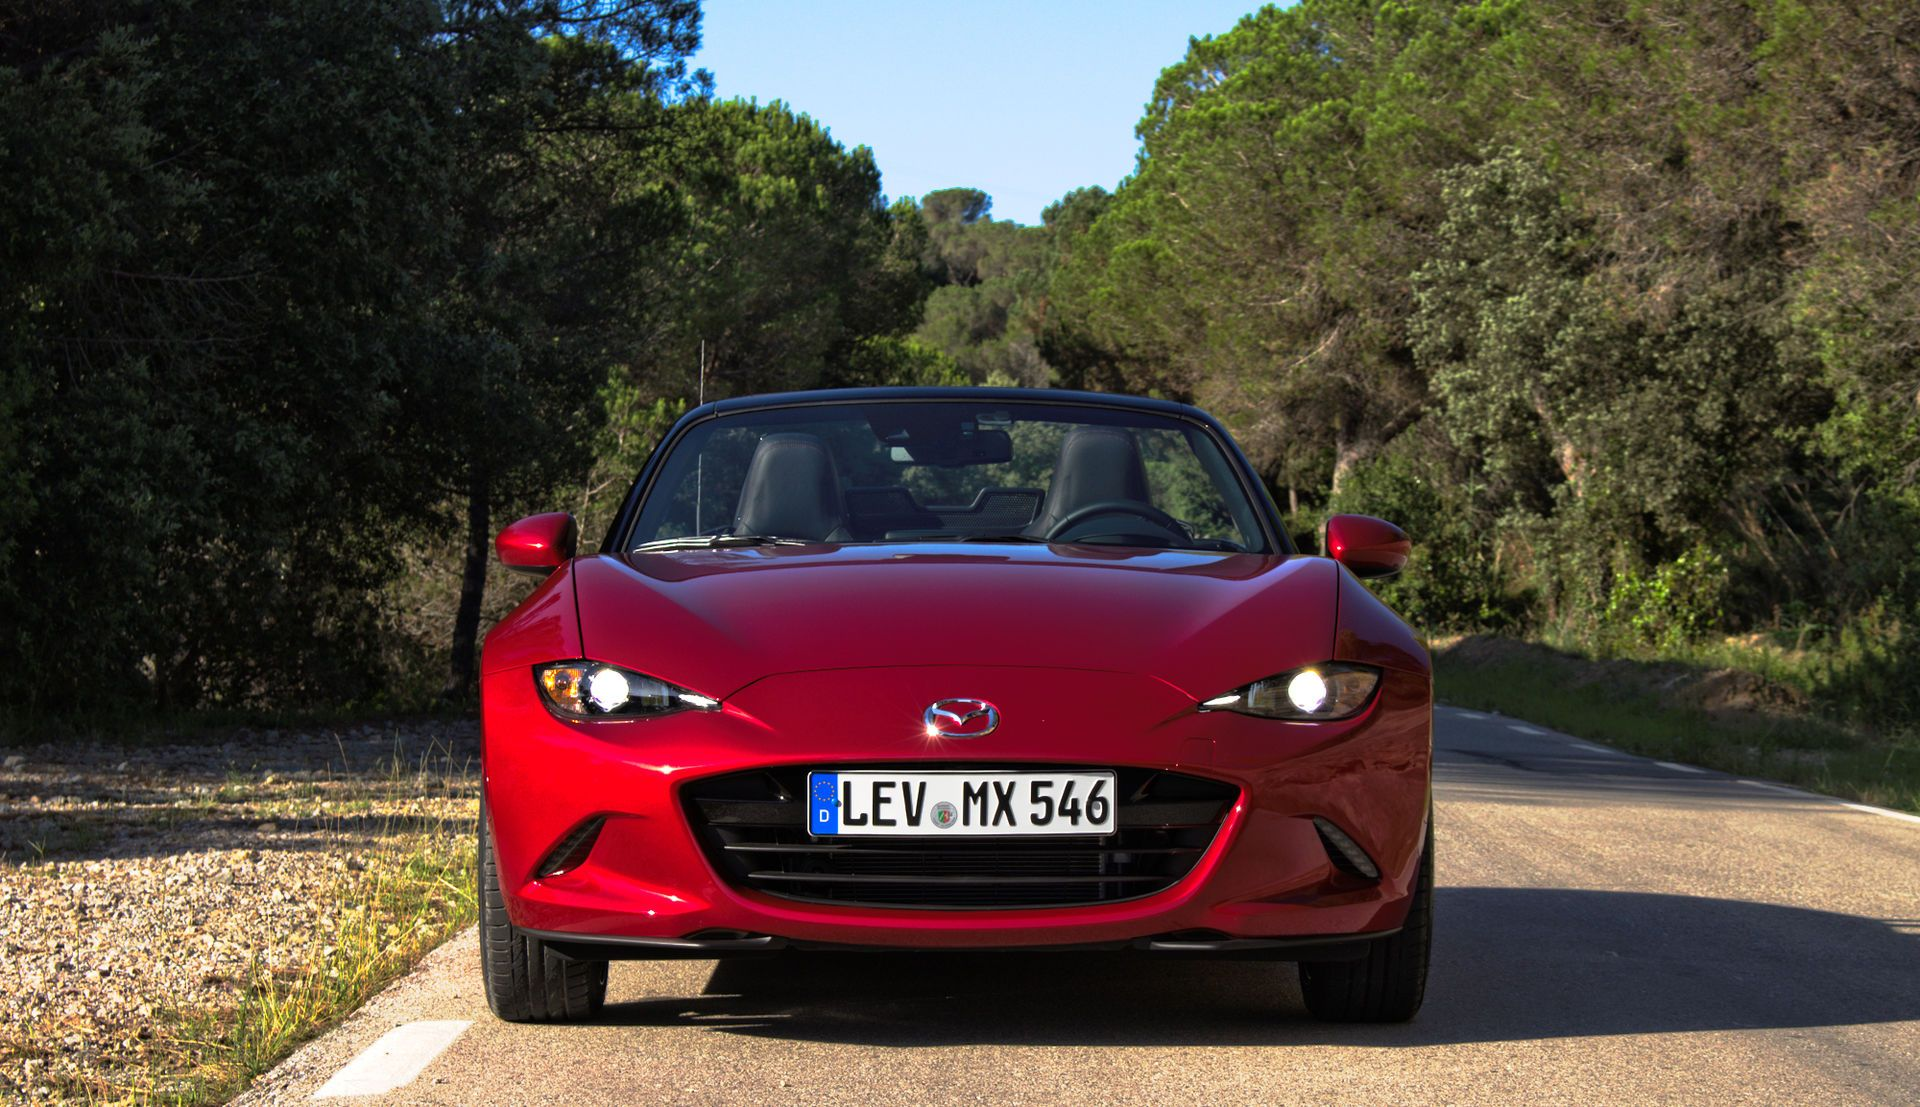 2015 Mazda MX5 ND 2.0 SKYACTIVG 160 iELOOP Rubinrot